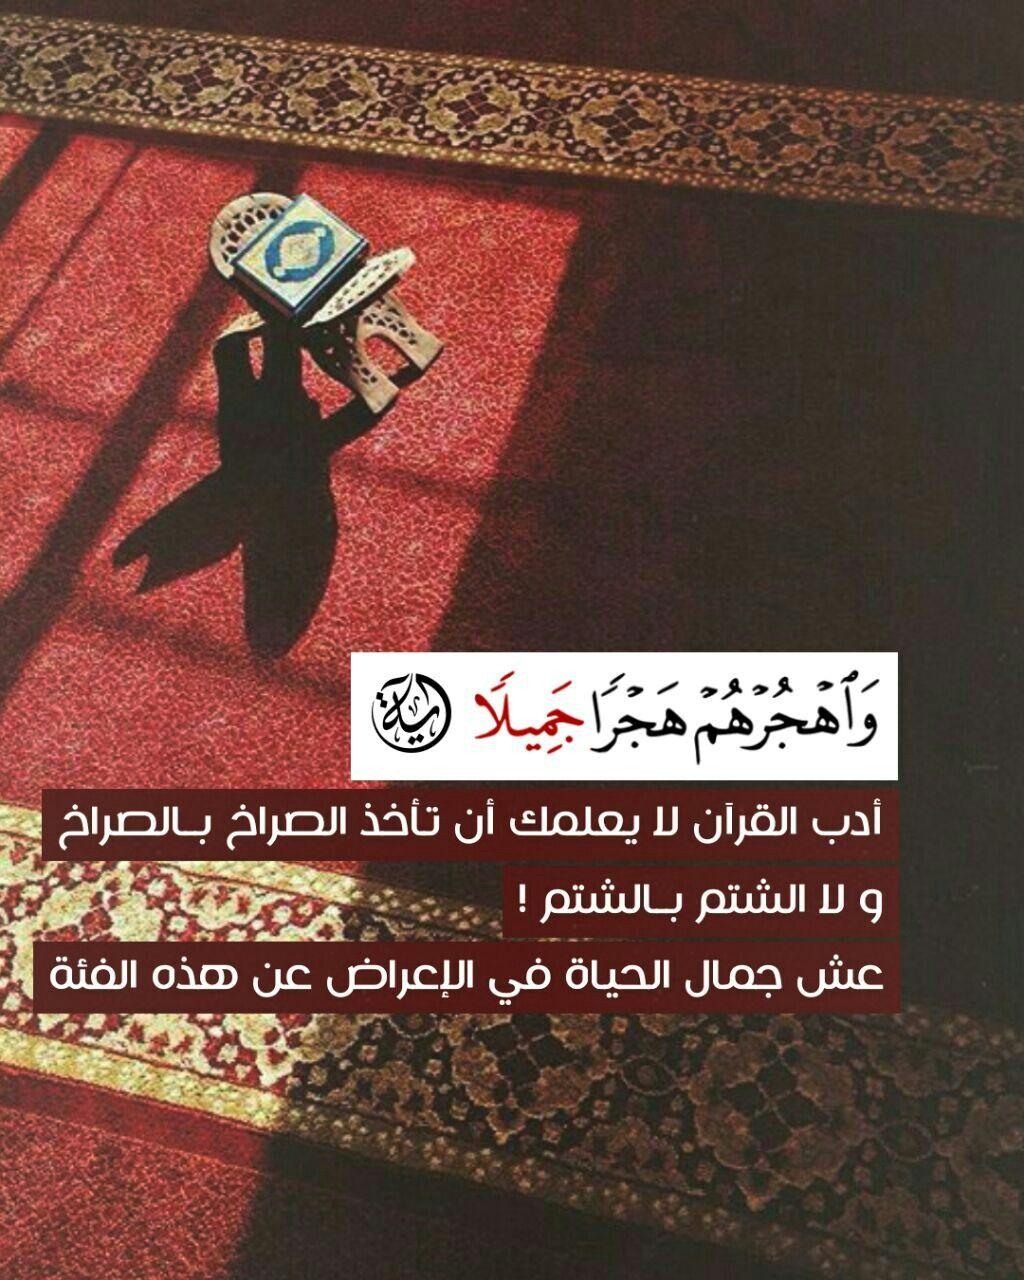 واهجرهم هجرا جميلا Quran Quotes Verses Quran Quotes Islamic Quotes Quran